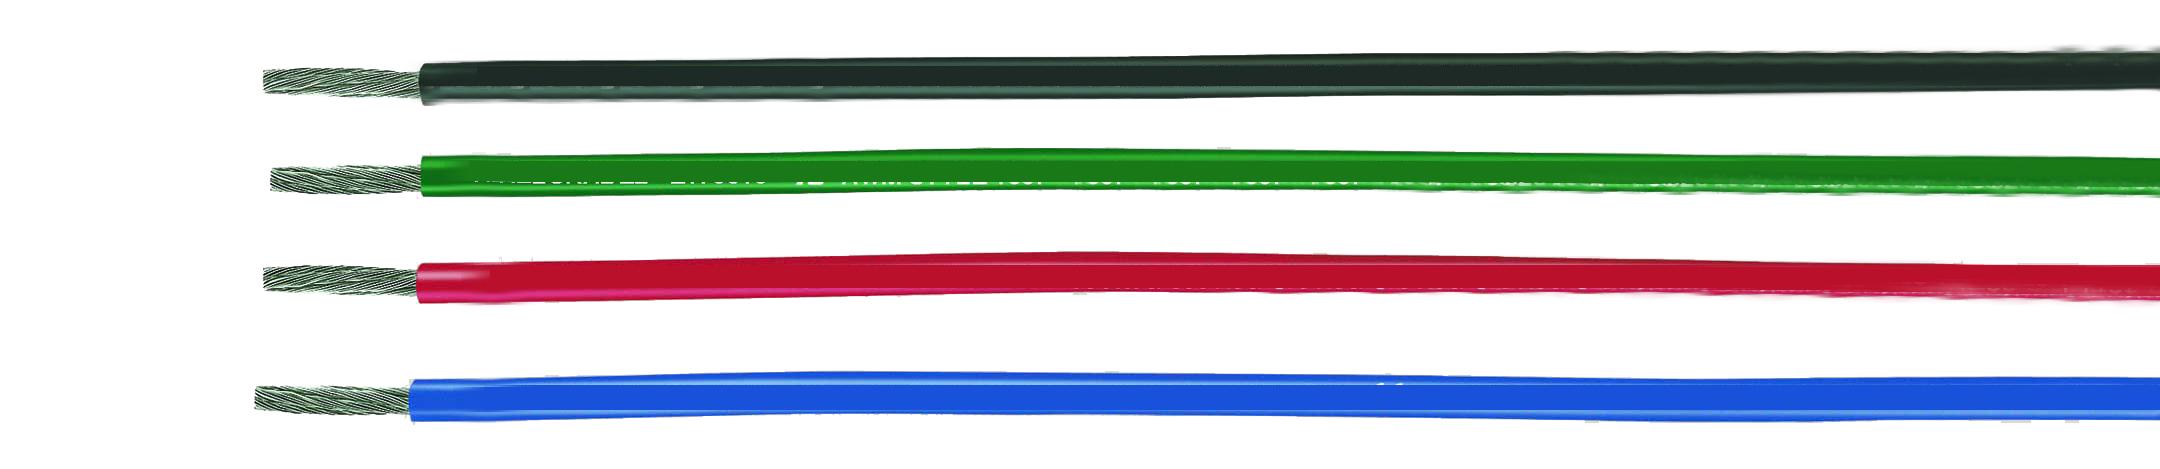 UL-Style 1007, CSA TR 64 PVC single conductors, 80�C, 300V, RoHS Approved, RoHS Compliant, European  , Hi-Tech Controls